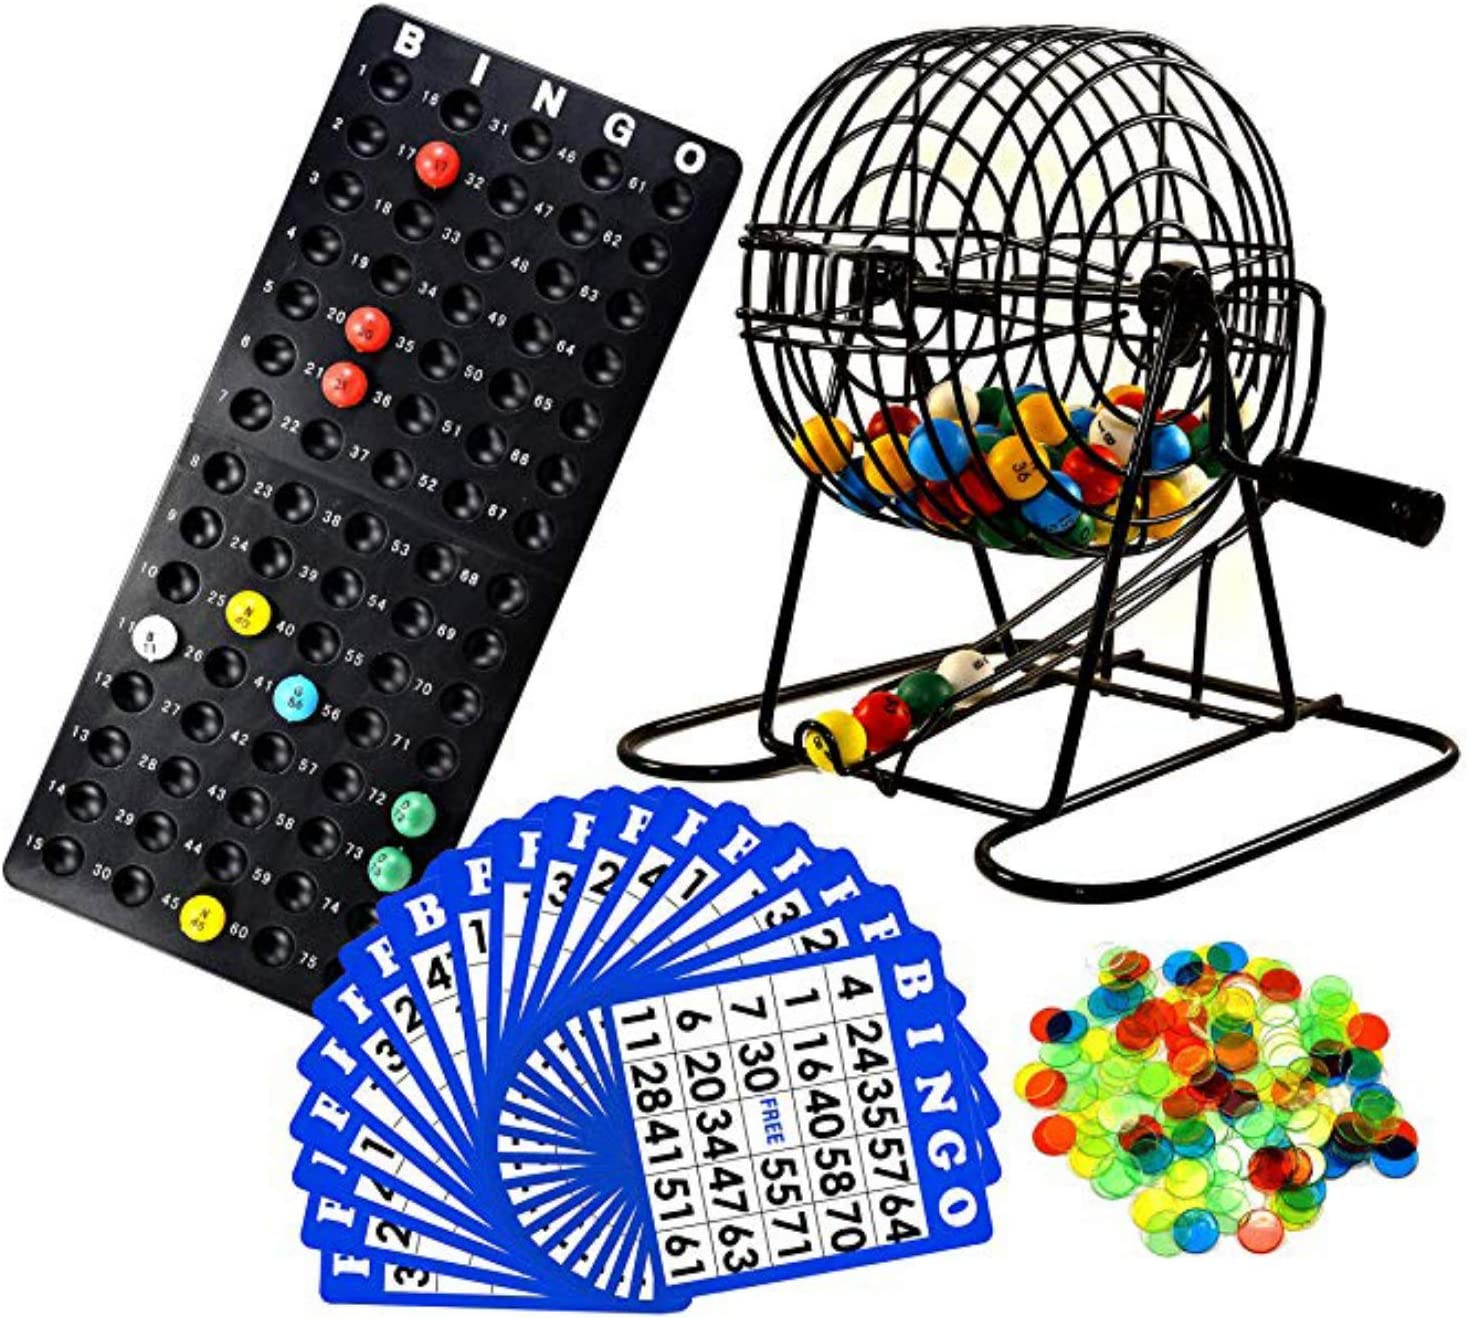 Vintage MiD-CENTURY BINGO CAGE w Wooden Numbered Bingo Balls Bingo Ball Cage Gold Wire Bingo Cage with Hand Crank /& Red Plastic Trim